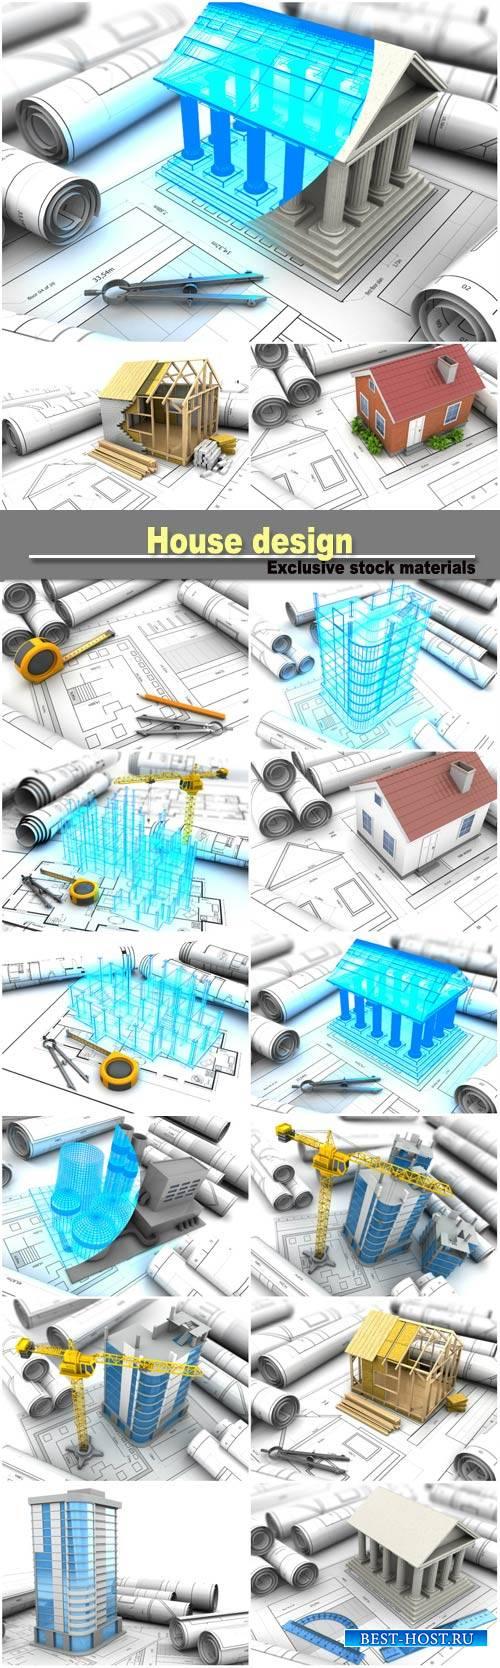 House design, building model